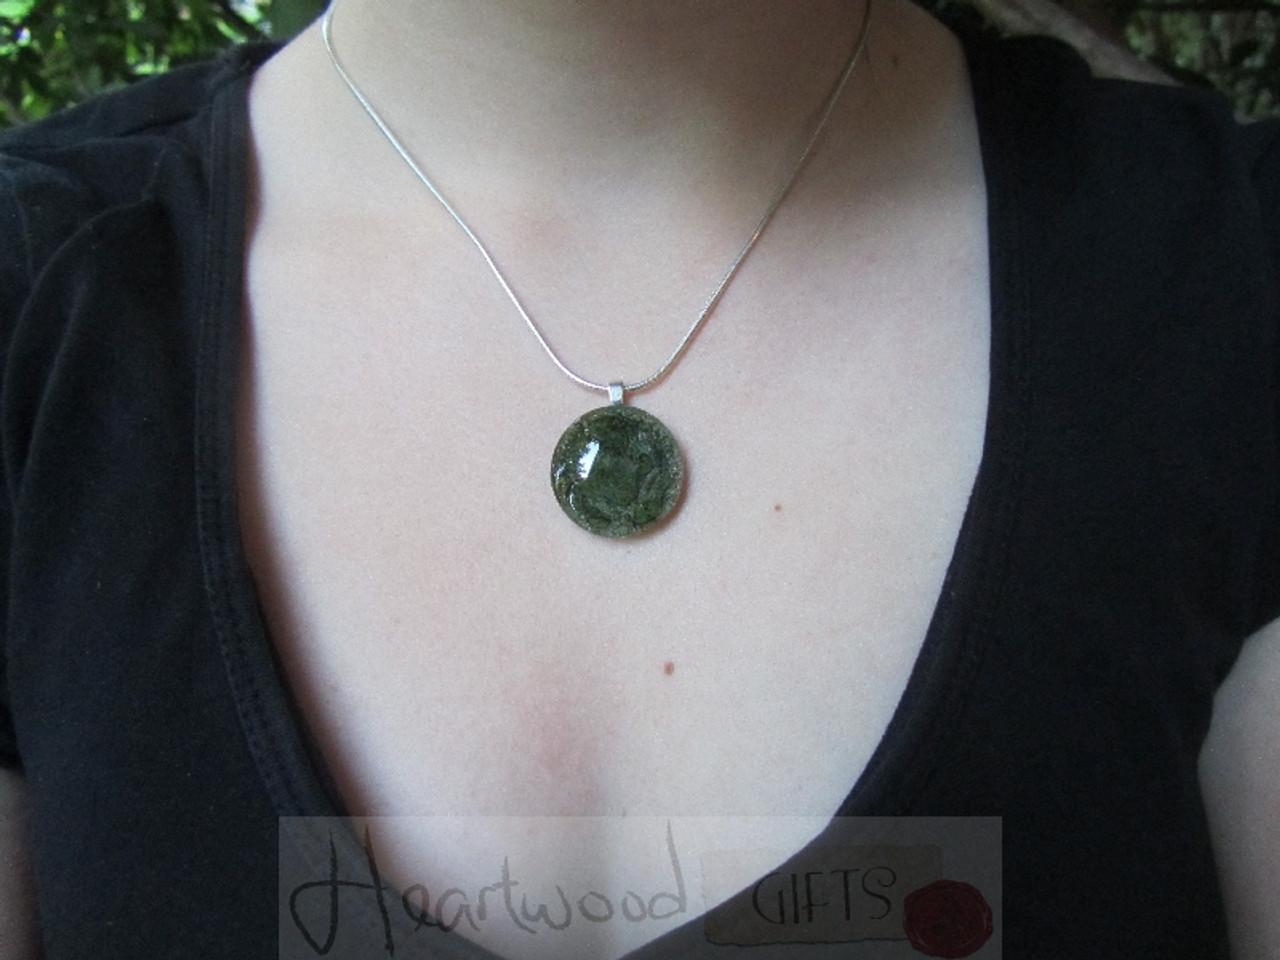 Model with Momo Glassworks Olive Glass Medallion